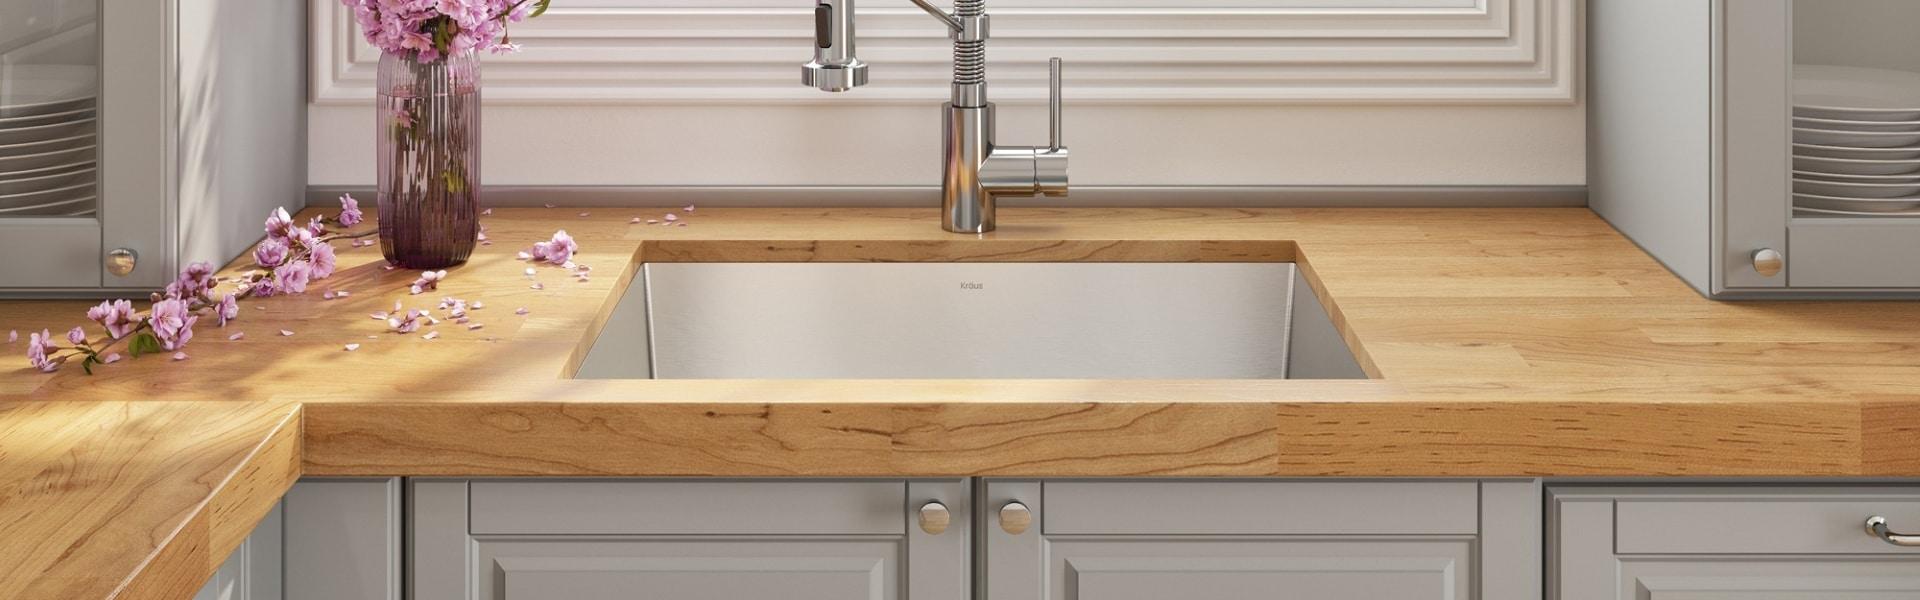 8 Best Undermount Kitchen Sinks Nov 2020 Reviews Buying Guide